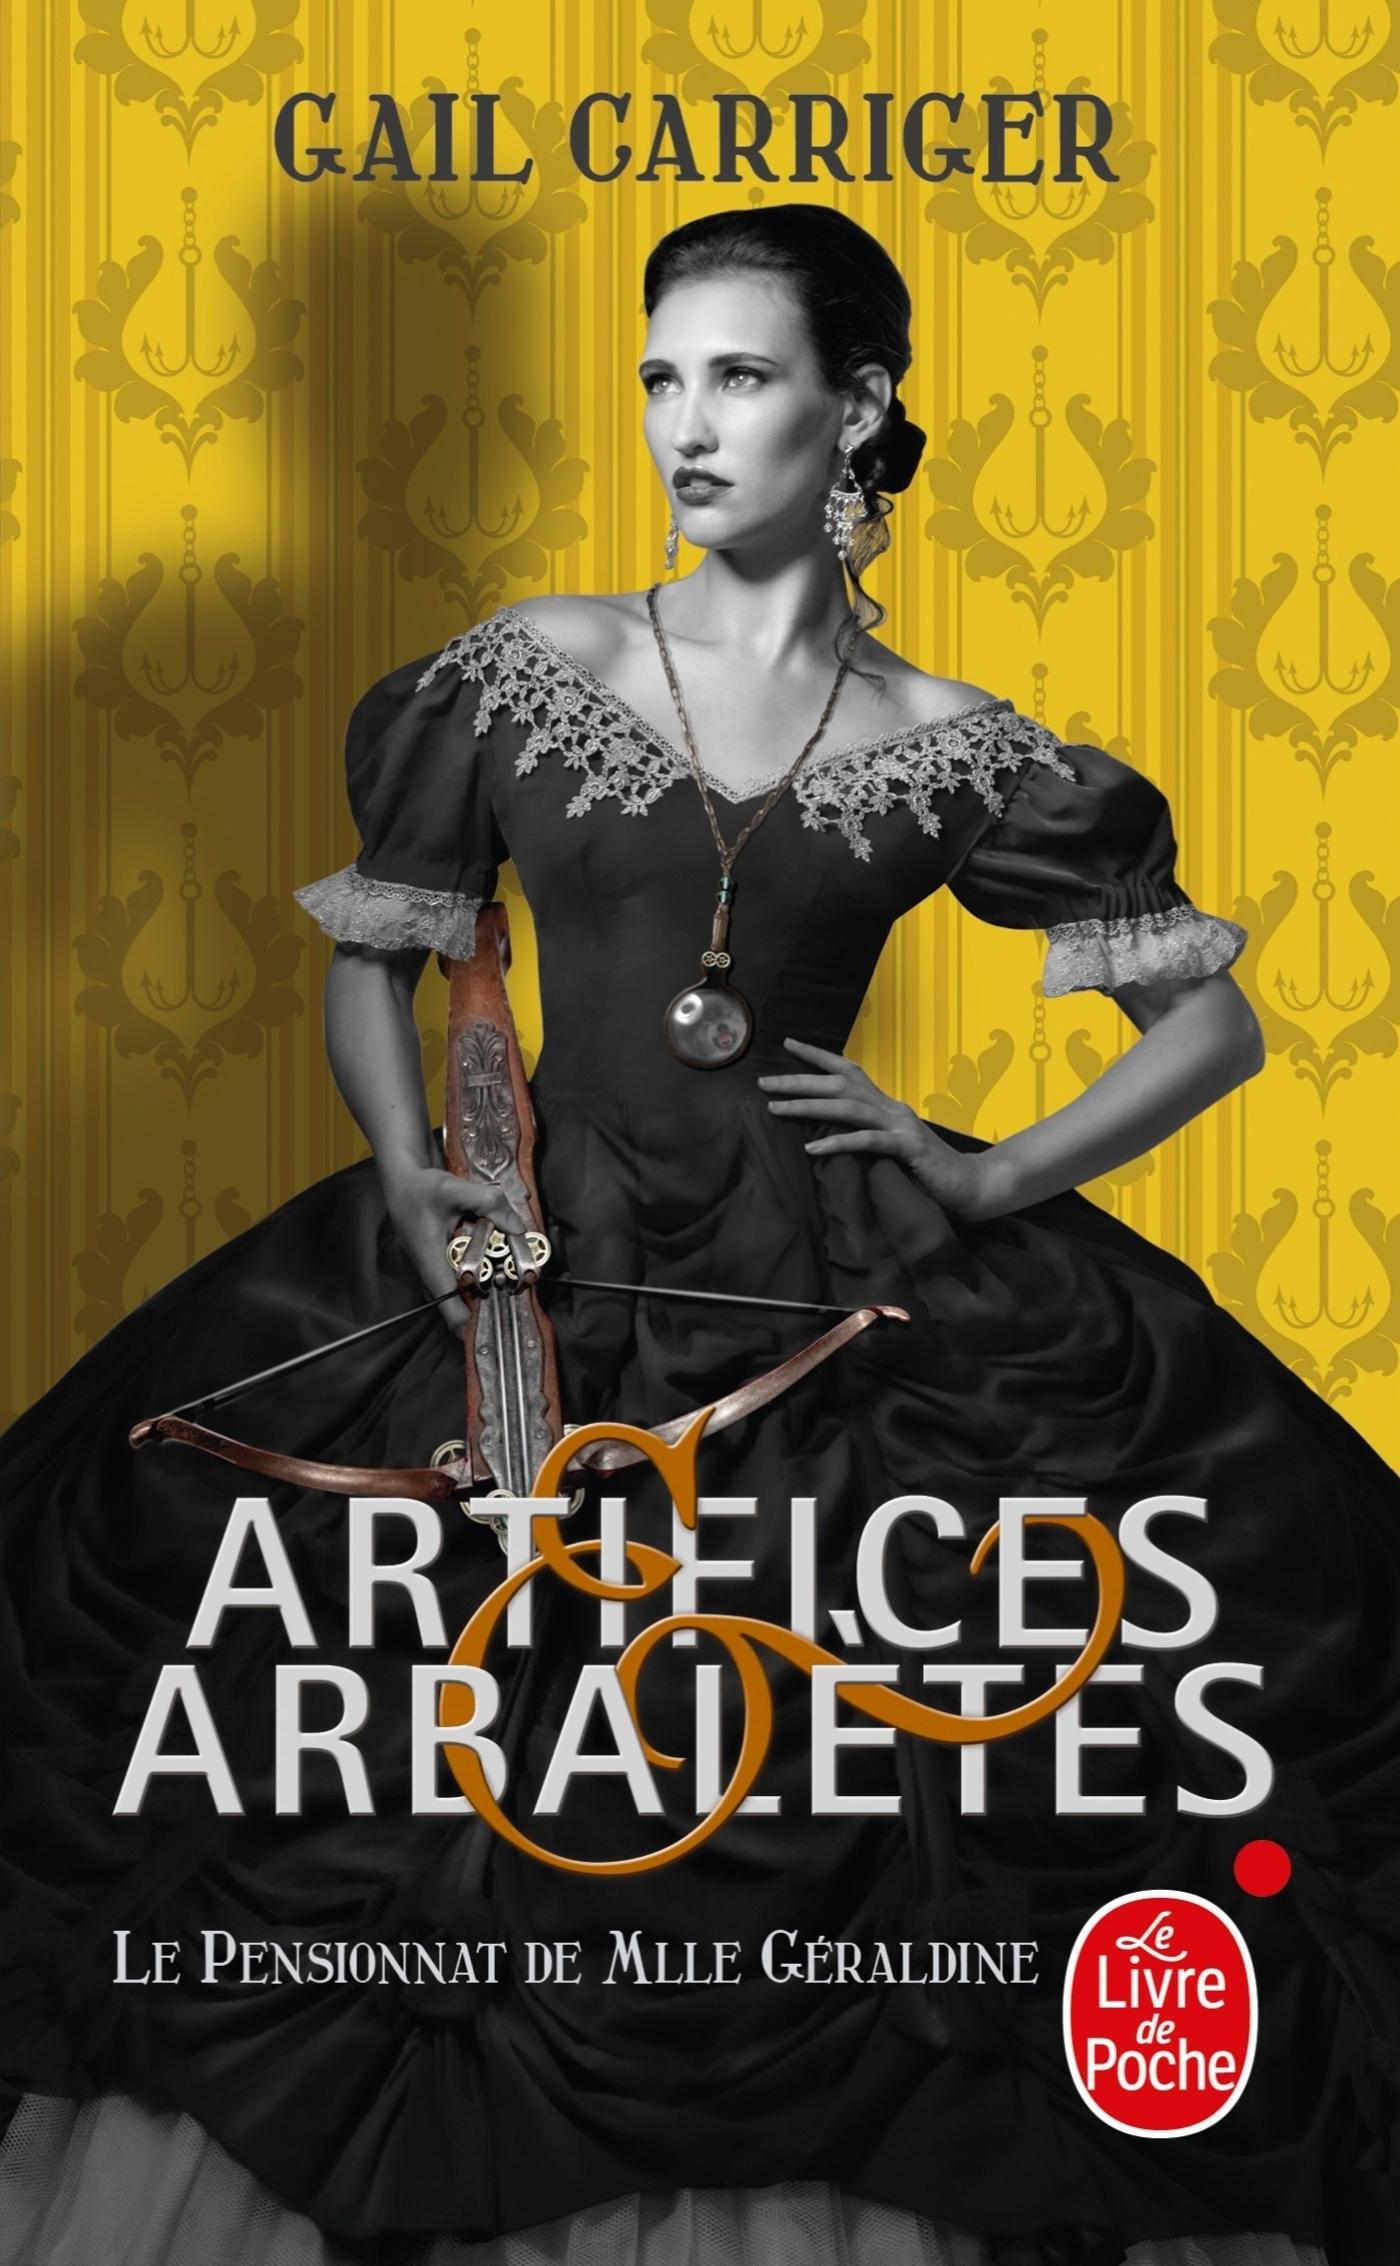 ARTIFICES & ARBALETES (LE PENSIONNAT DE MLLE GERALDINE, TOME 4) )